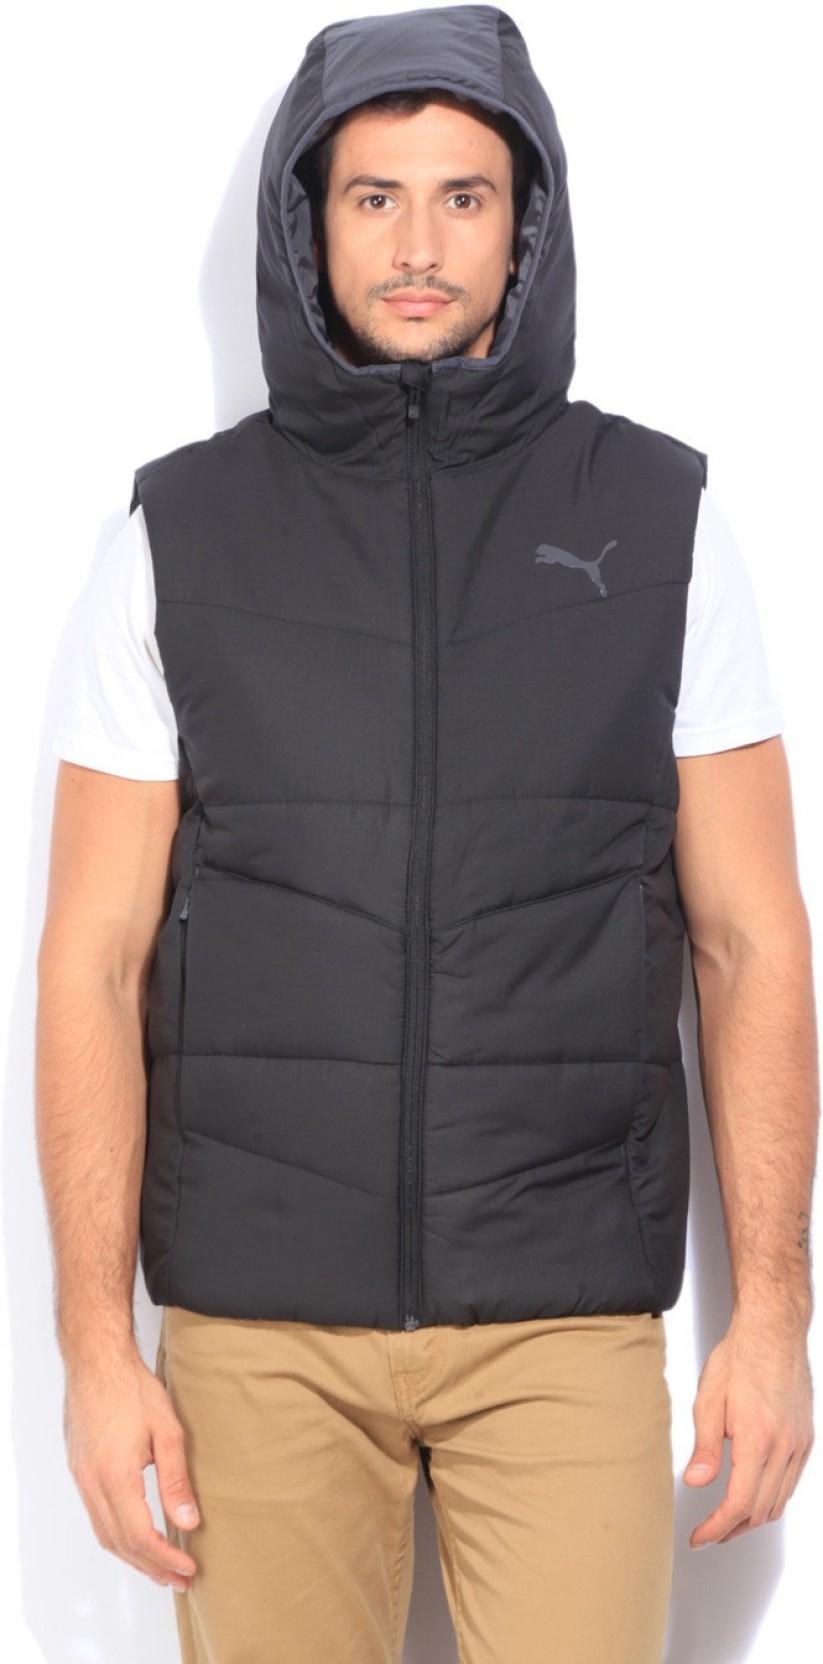 21c7725dd604 Puma Sleeveless Self Design Men s Quilted Jacket - Buy Puma Black ...